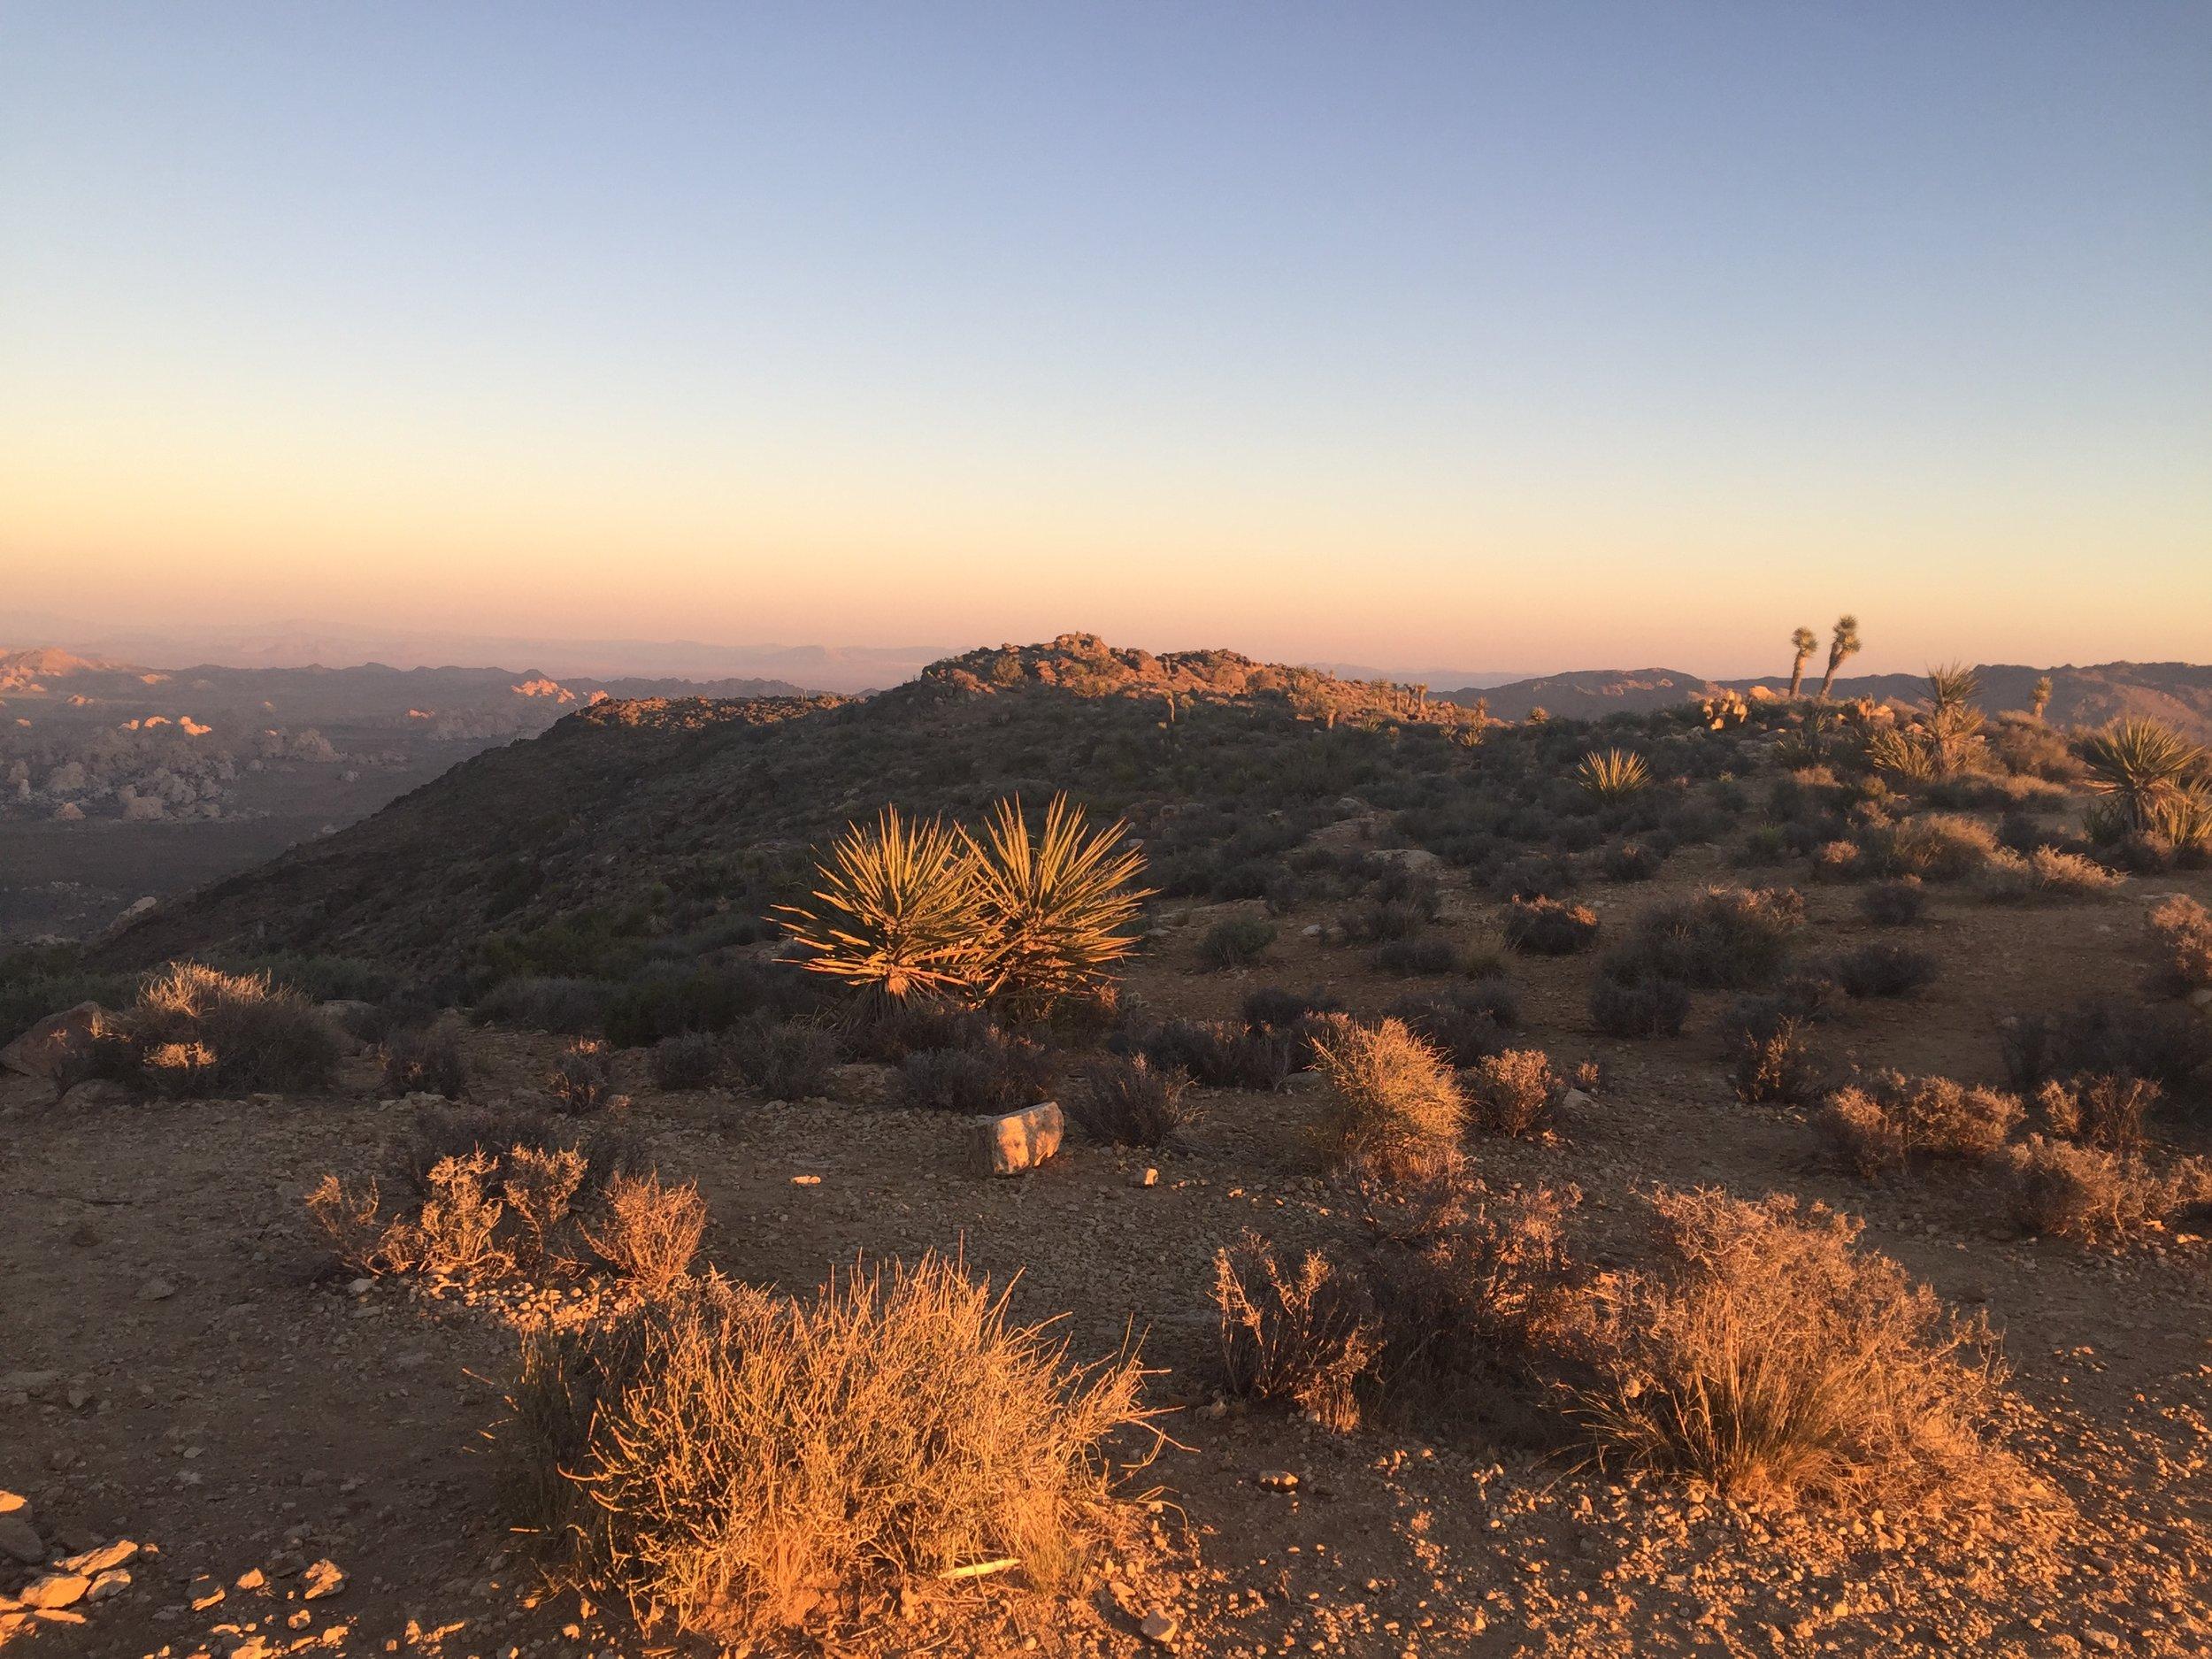 Sunrise at Ryan Mountain's summit, Joshua Tree National Park, California